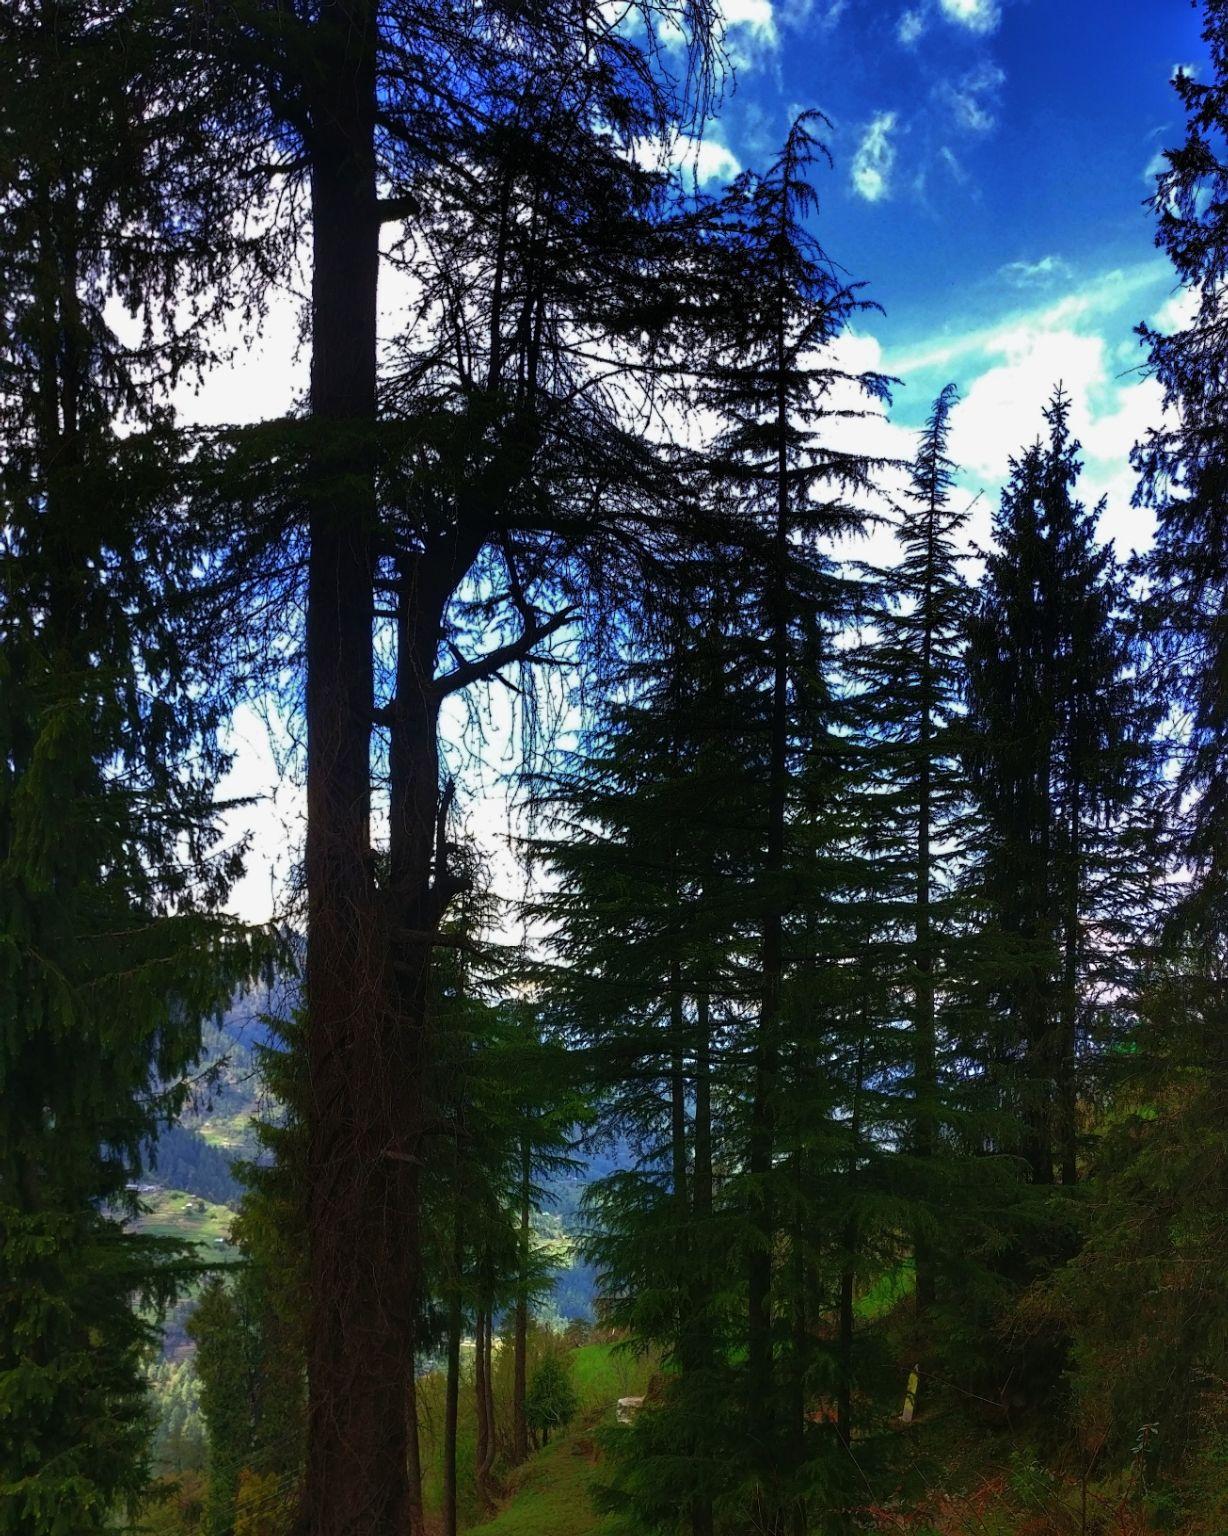 Photo of Tirthan Valley By amit gupta